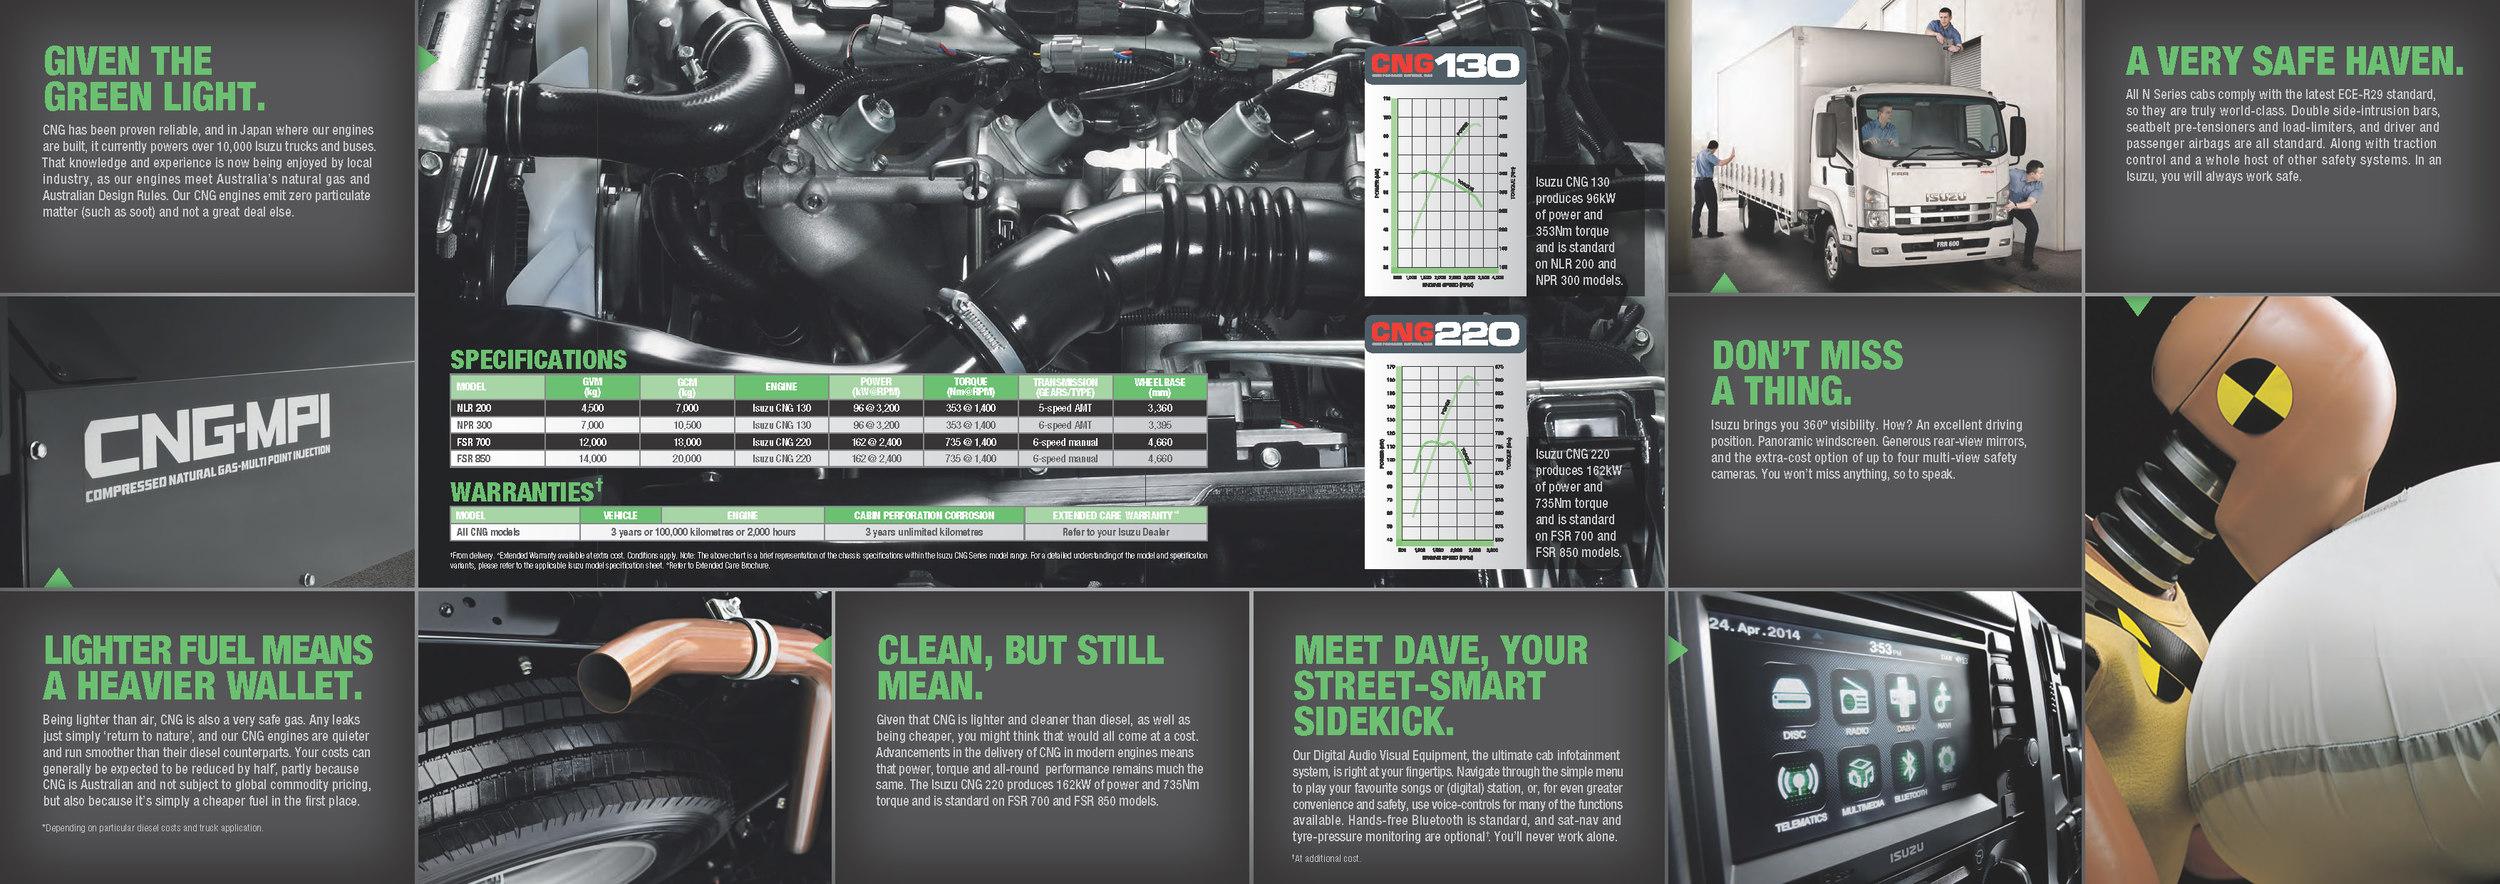 ISZ9020 CNG Brochure EffAug14_Page_3.jpg